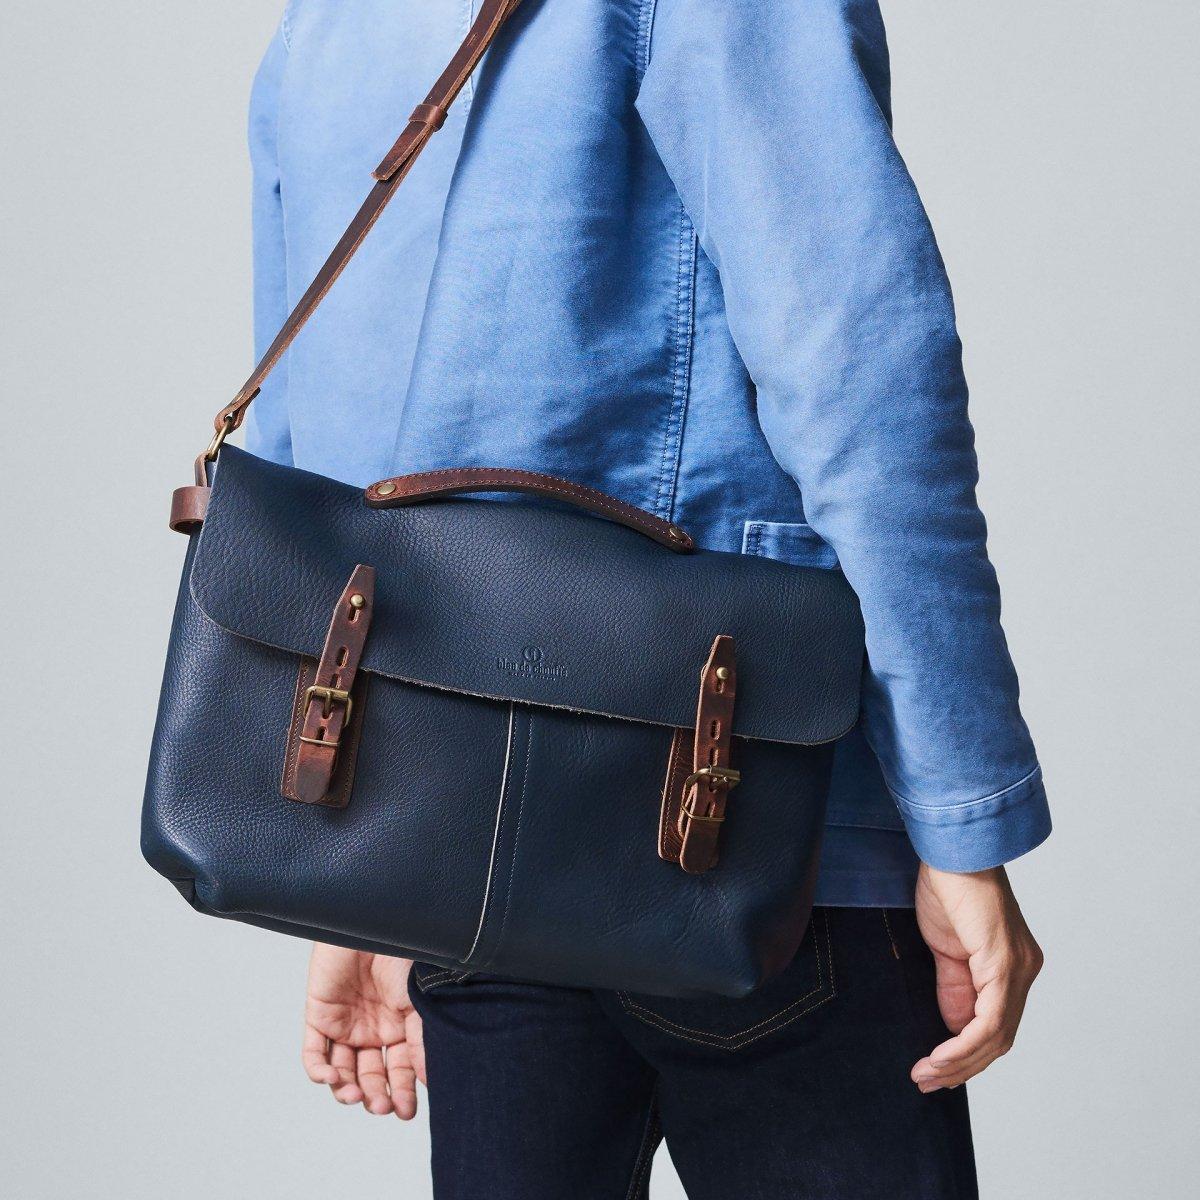 Lucien Satchel bag - Cuba Libre (image n°5)